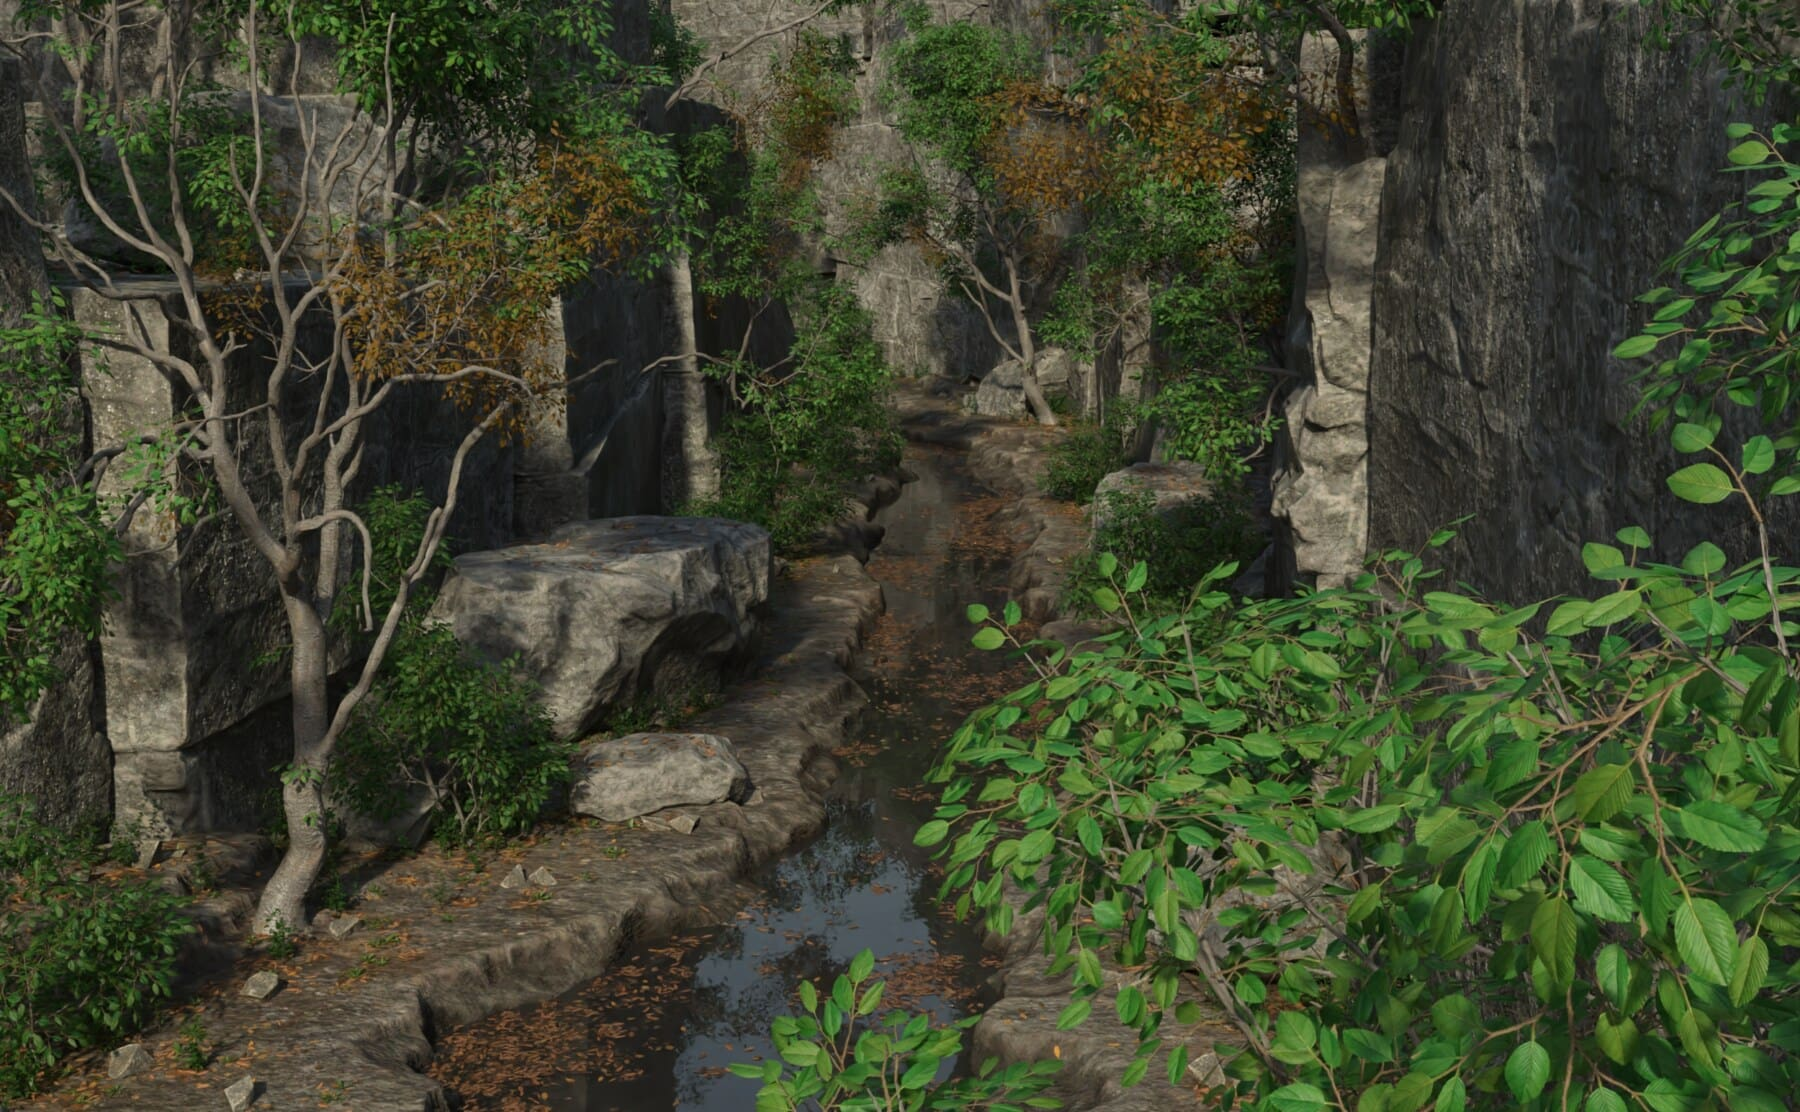 art, digital, visuals, photomontage, forest, creek, water, leaf, landscape, tree